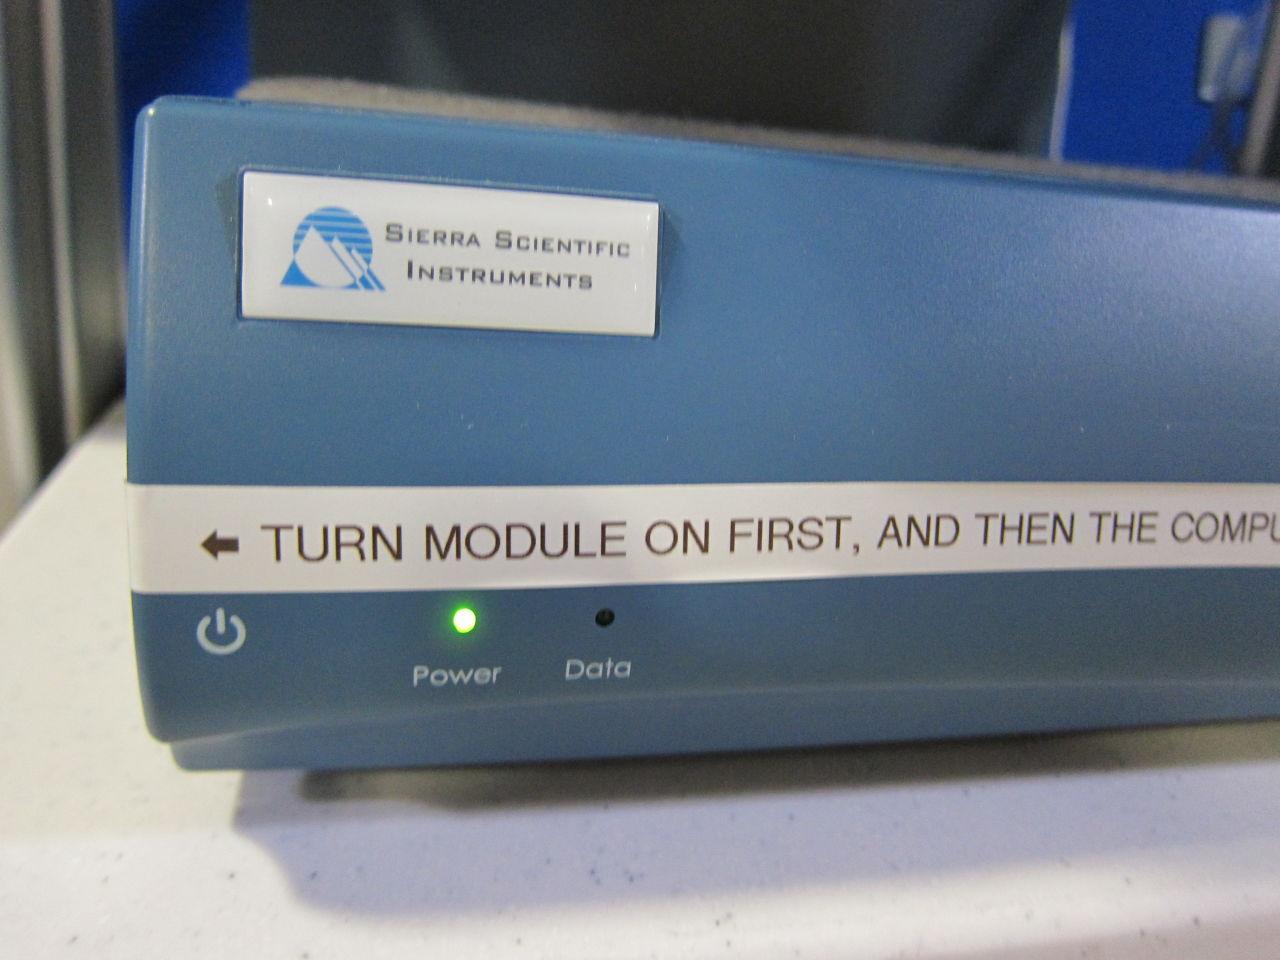 SIERRA SCIENTIFIC INSTRUMENTS Manoscan 360 Manometry/PH Testing